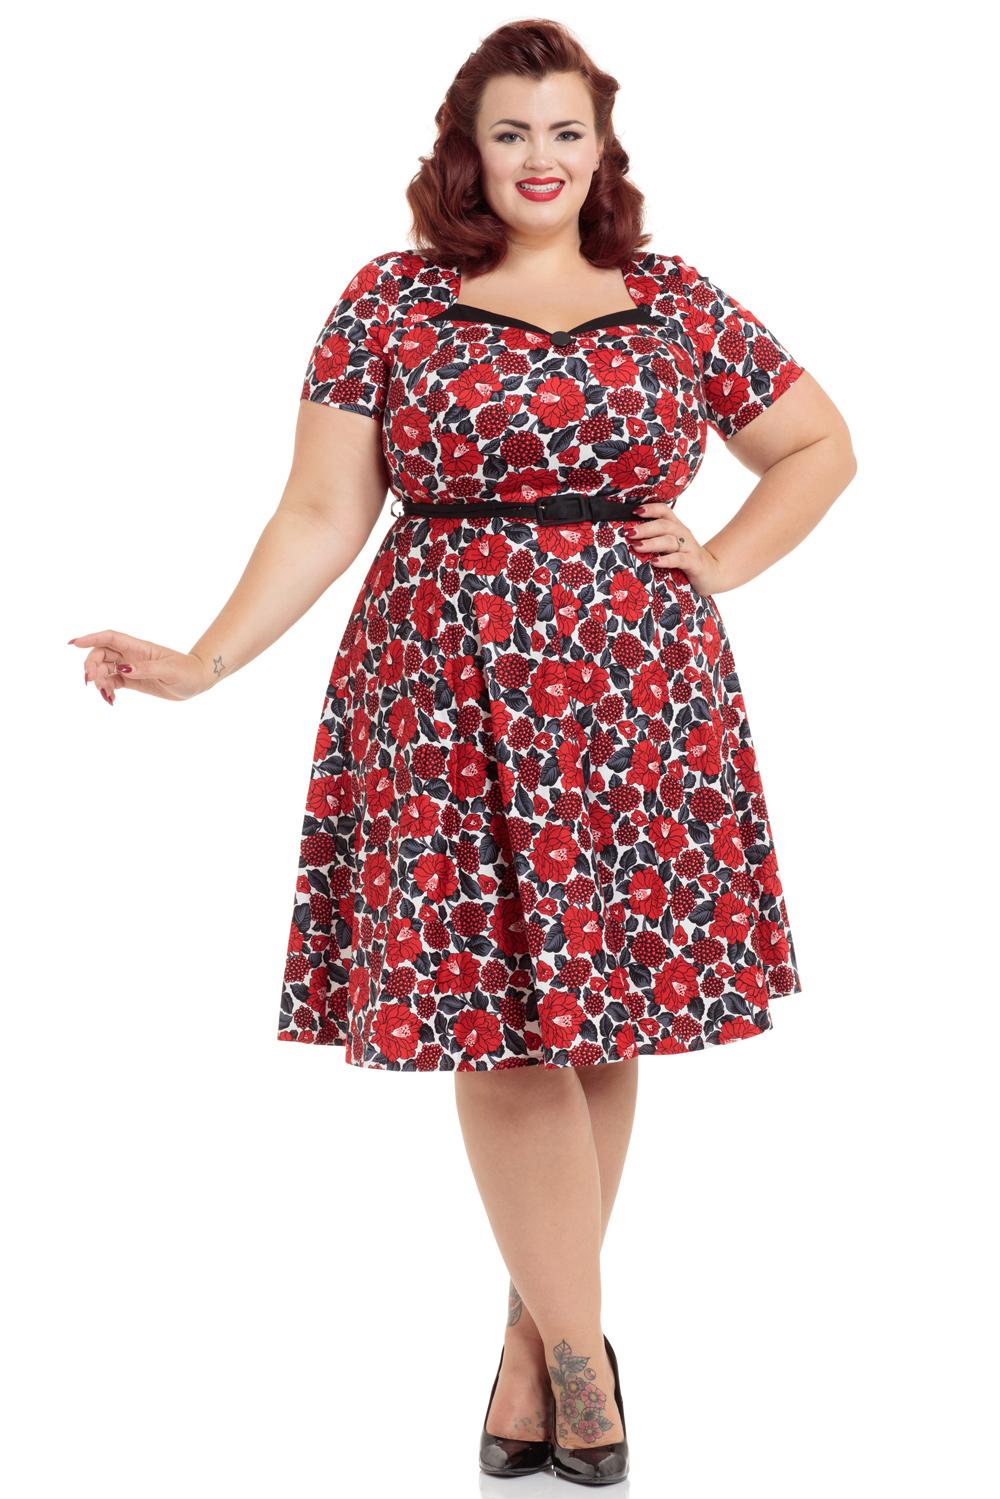 Poppy Red Floral Skater Plus Size Dress